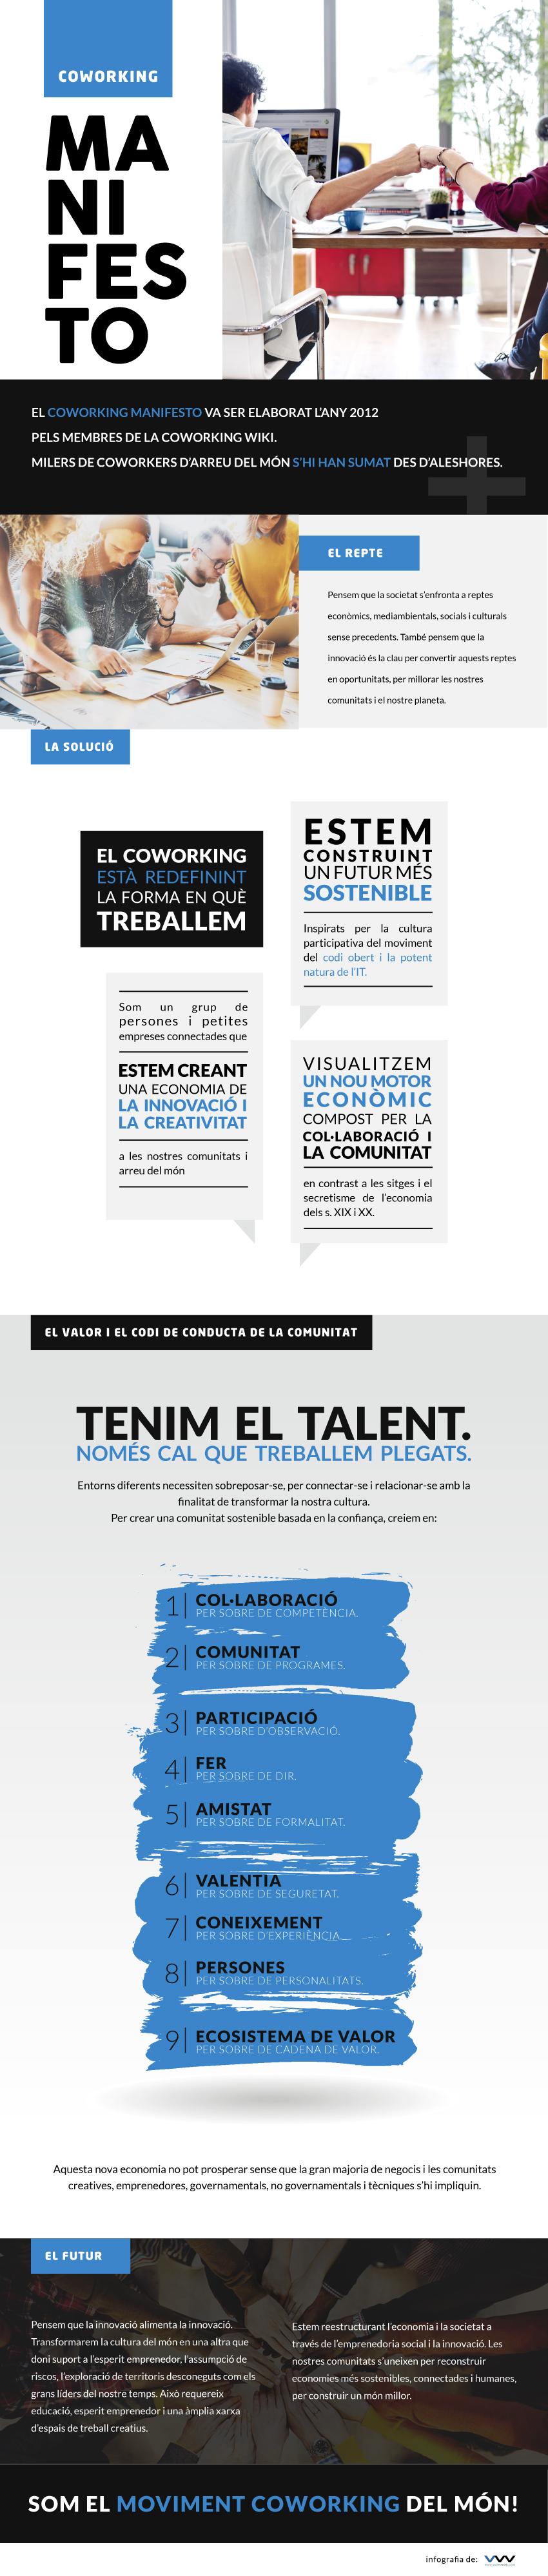 Manifesto-coworking_pekCAT